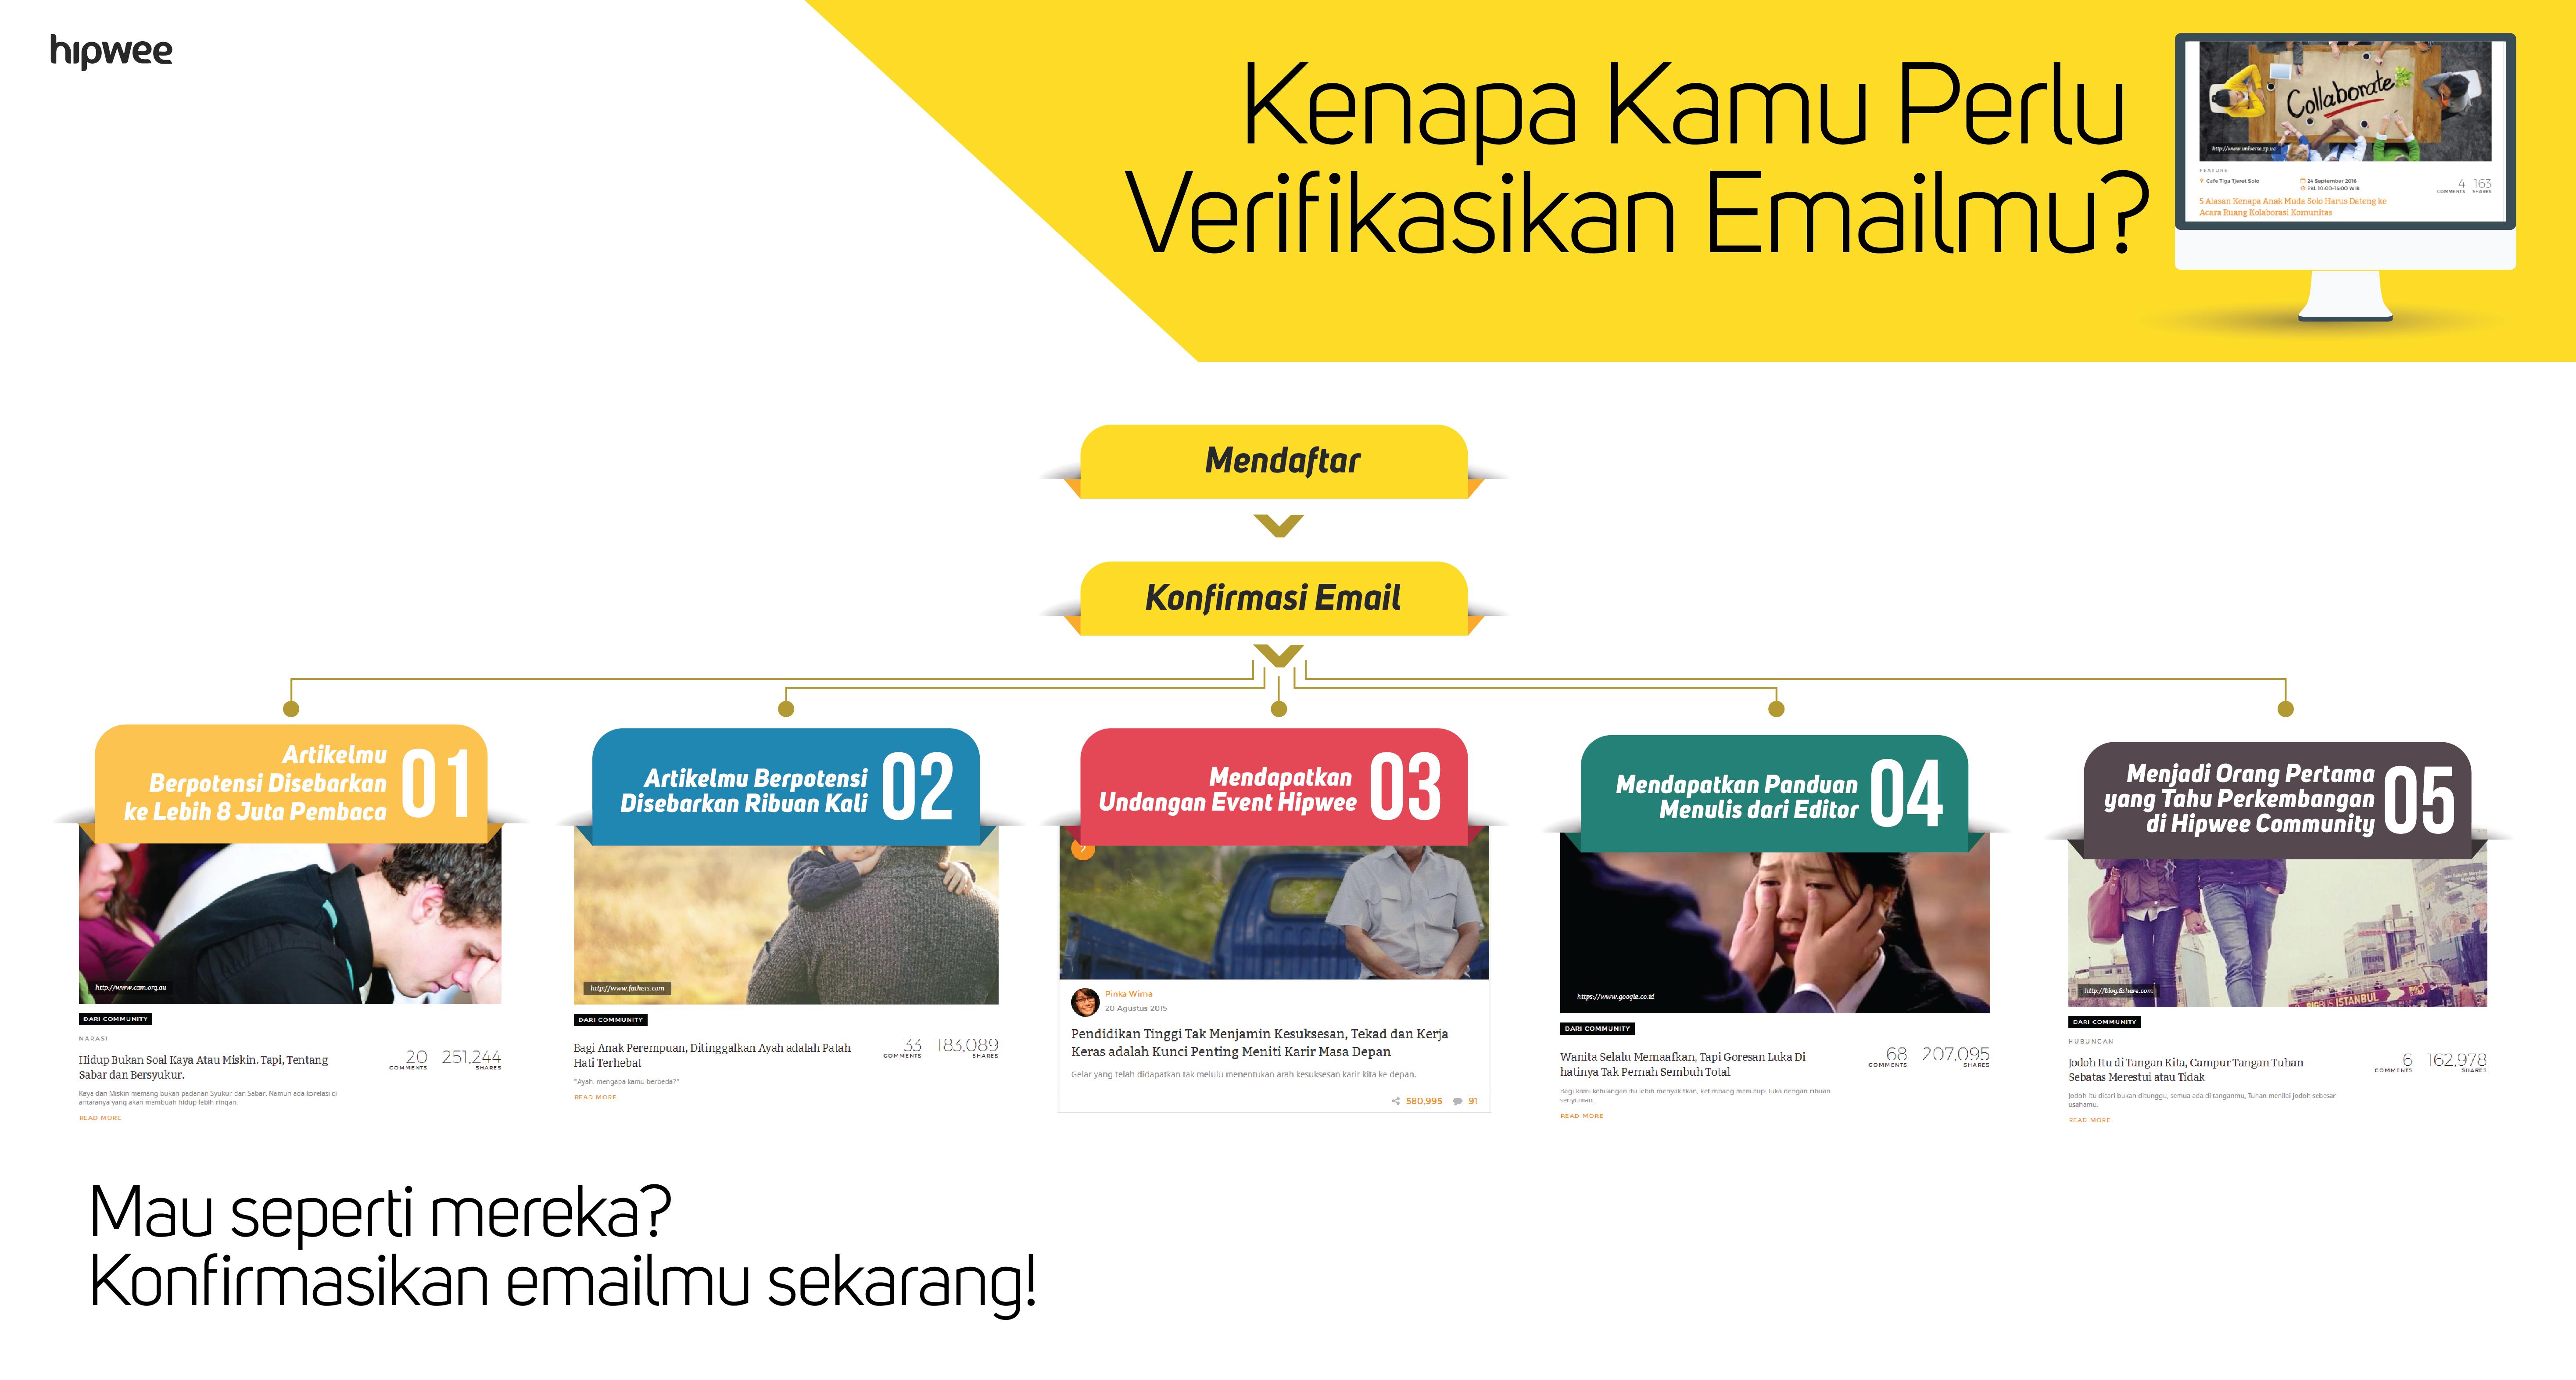 Infografis Kenapa Kamu Harus Konfirmasi Email